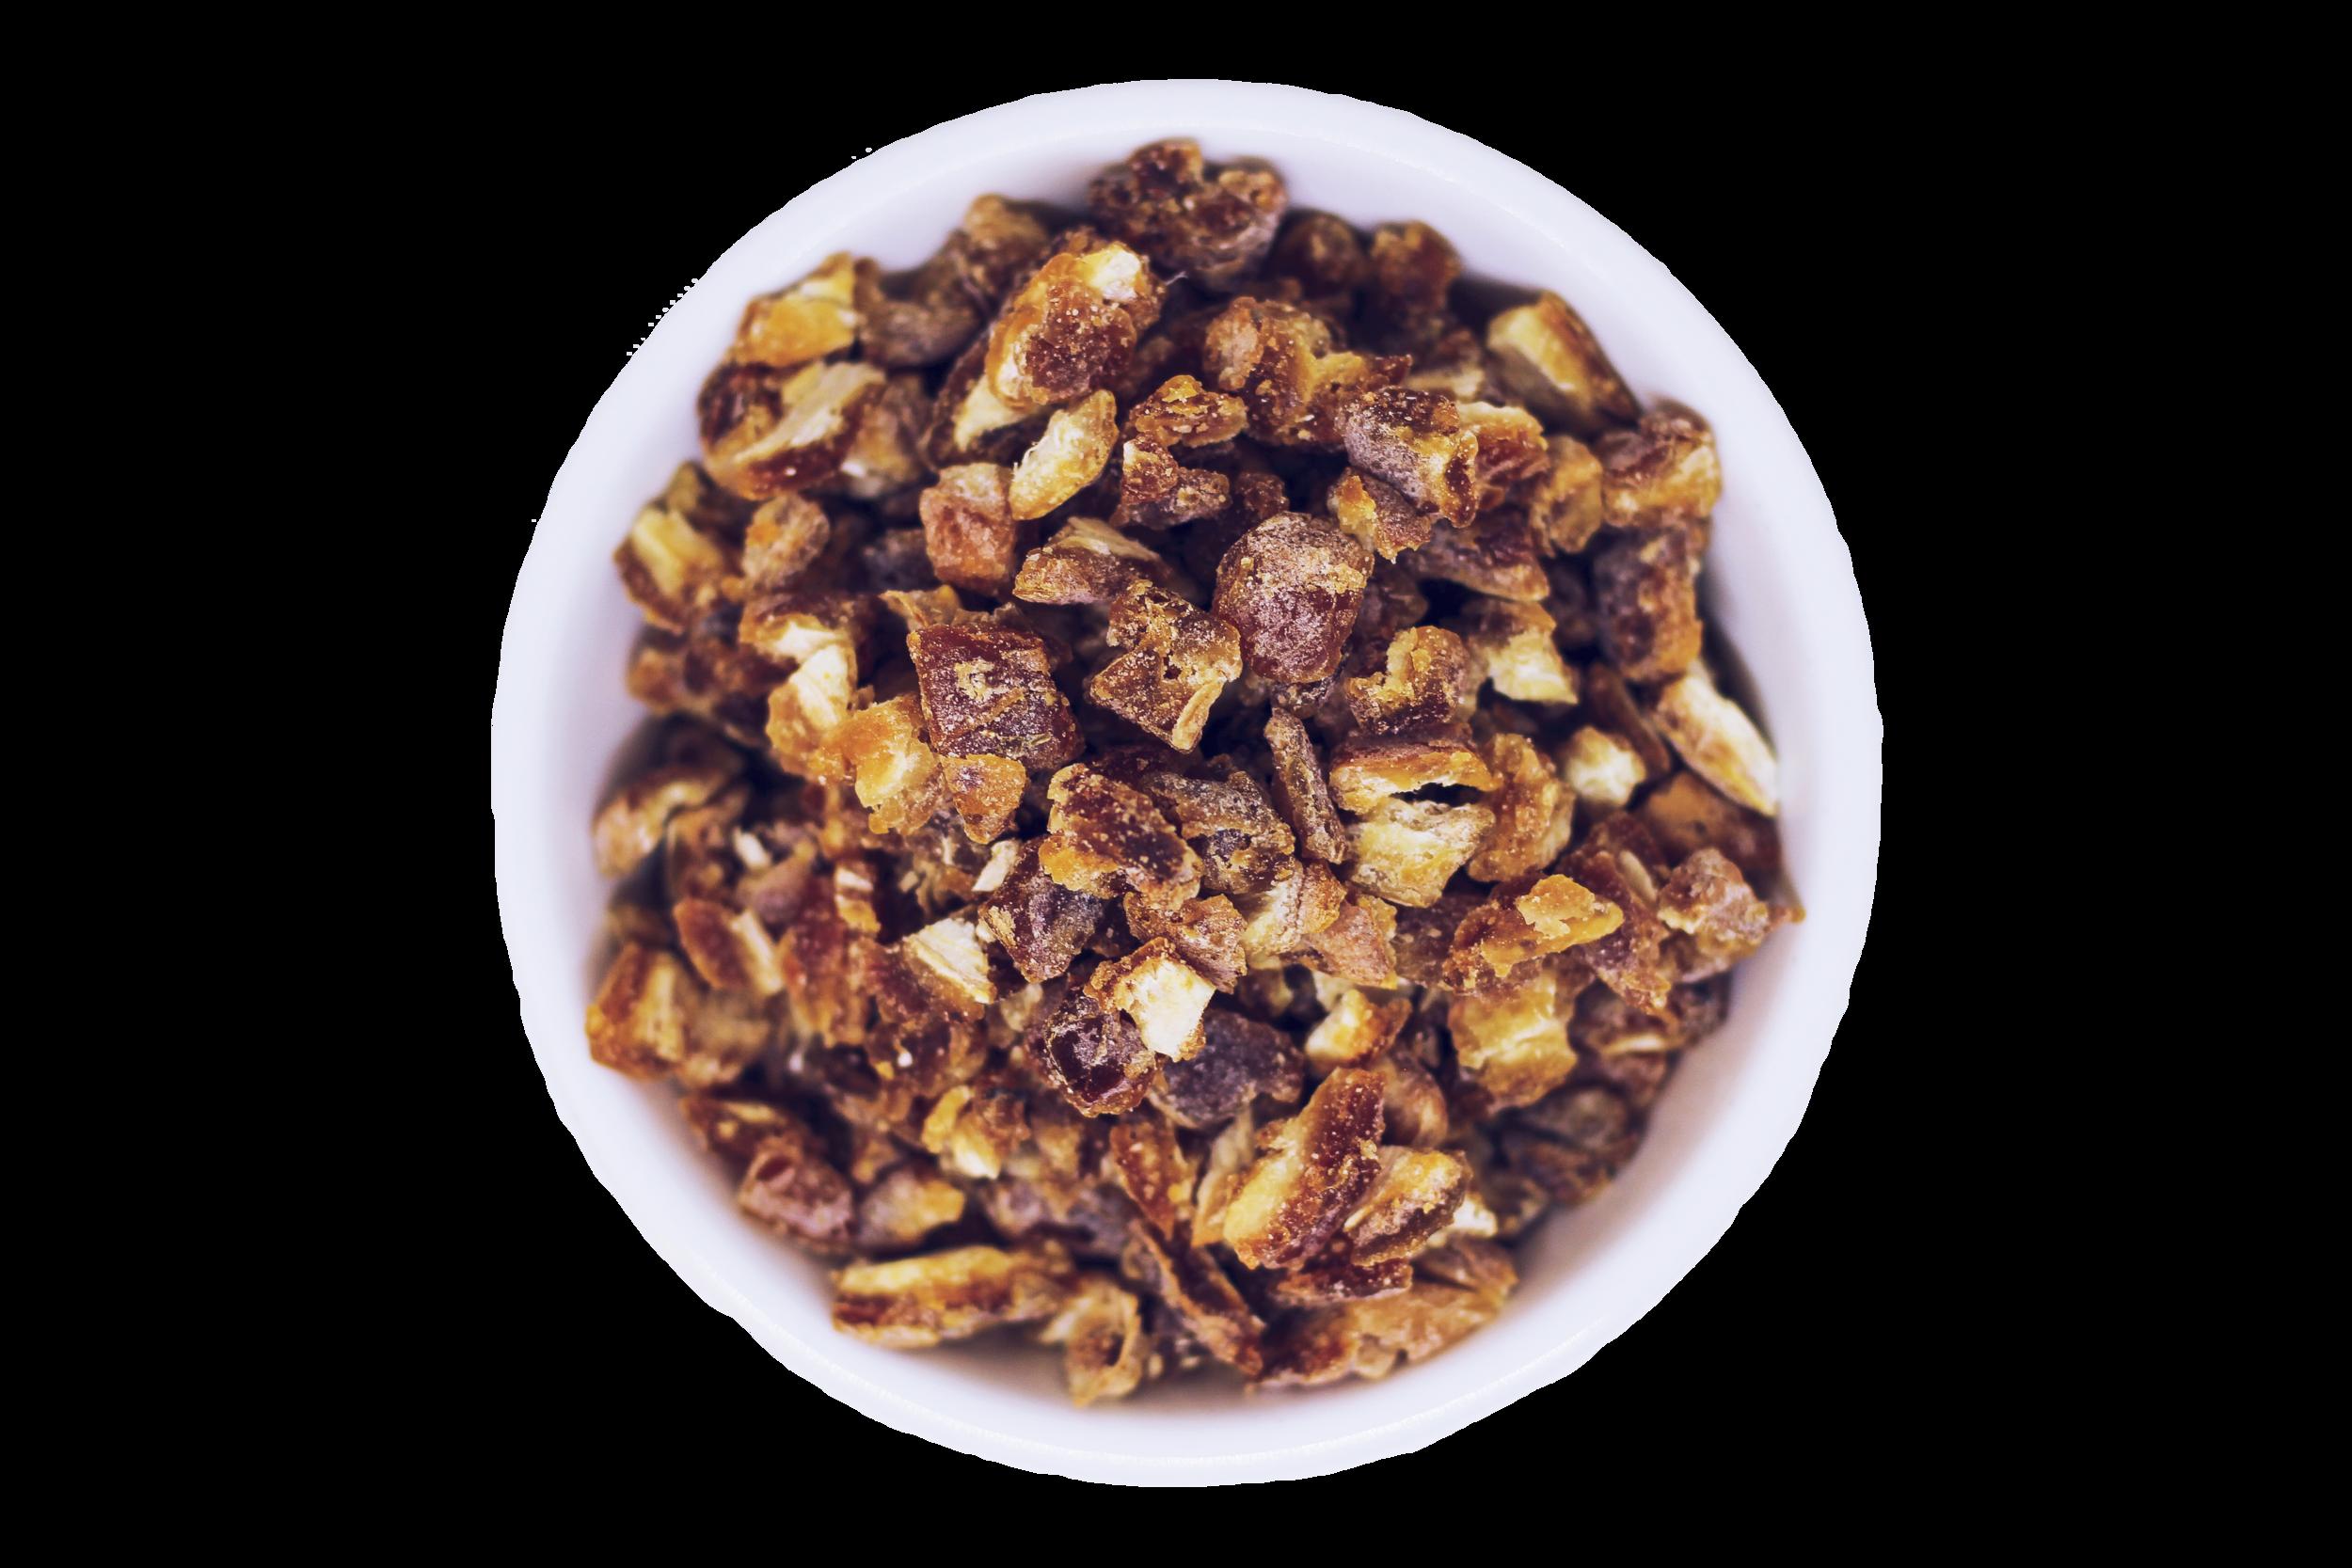 Chopped dates - al barakah dates